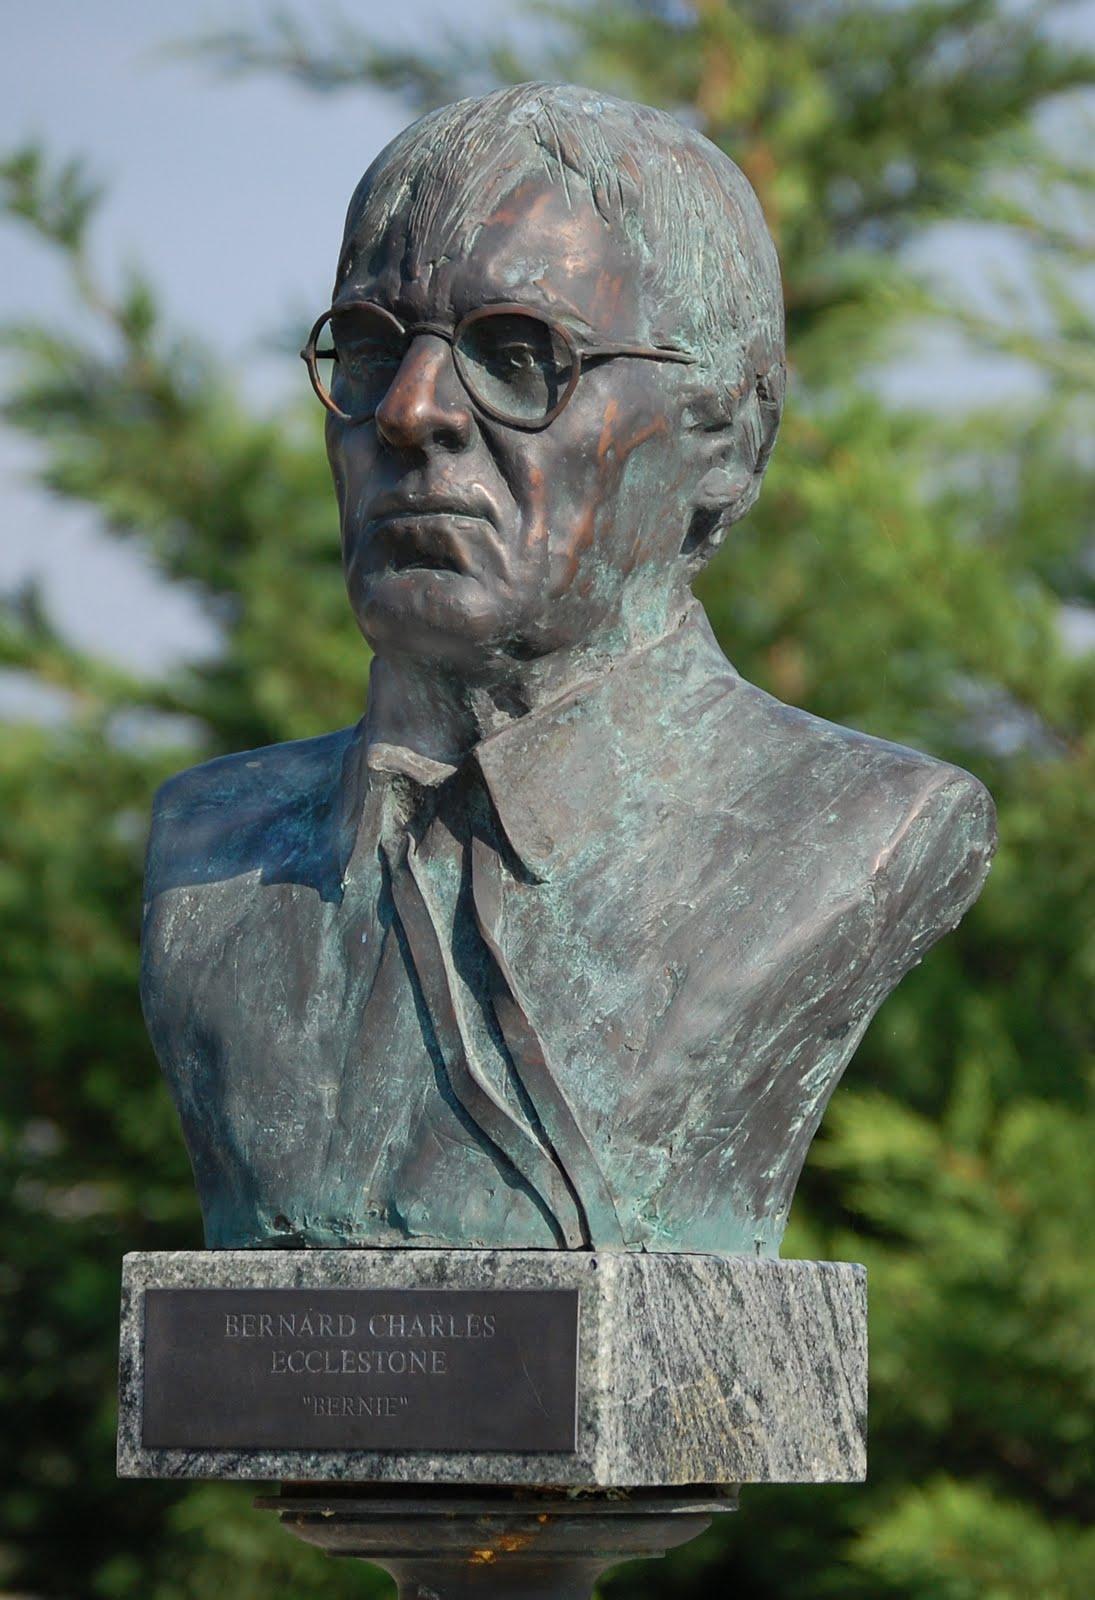 http://2.bp.blogspot.com/_-9T5C75kdKk/S78Lcr0WDfI/AAAAAAAACBQ/aEaLRqStJBA/s1600/Bernie_Charles_statue.jpg